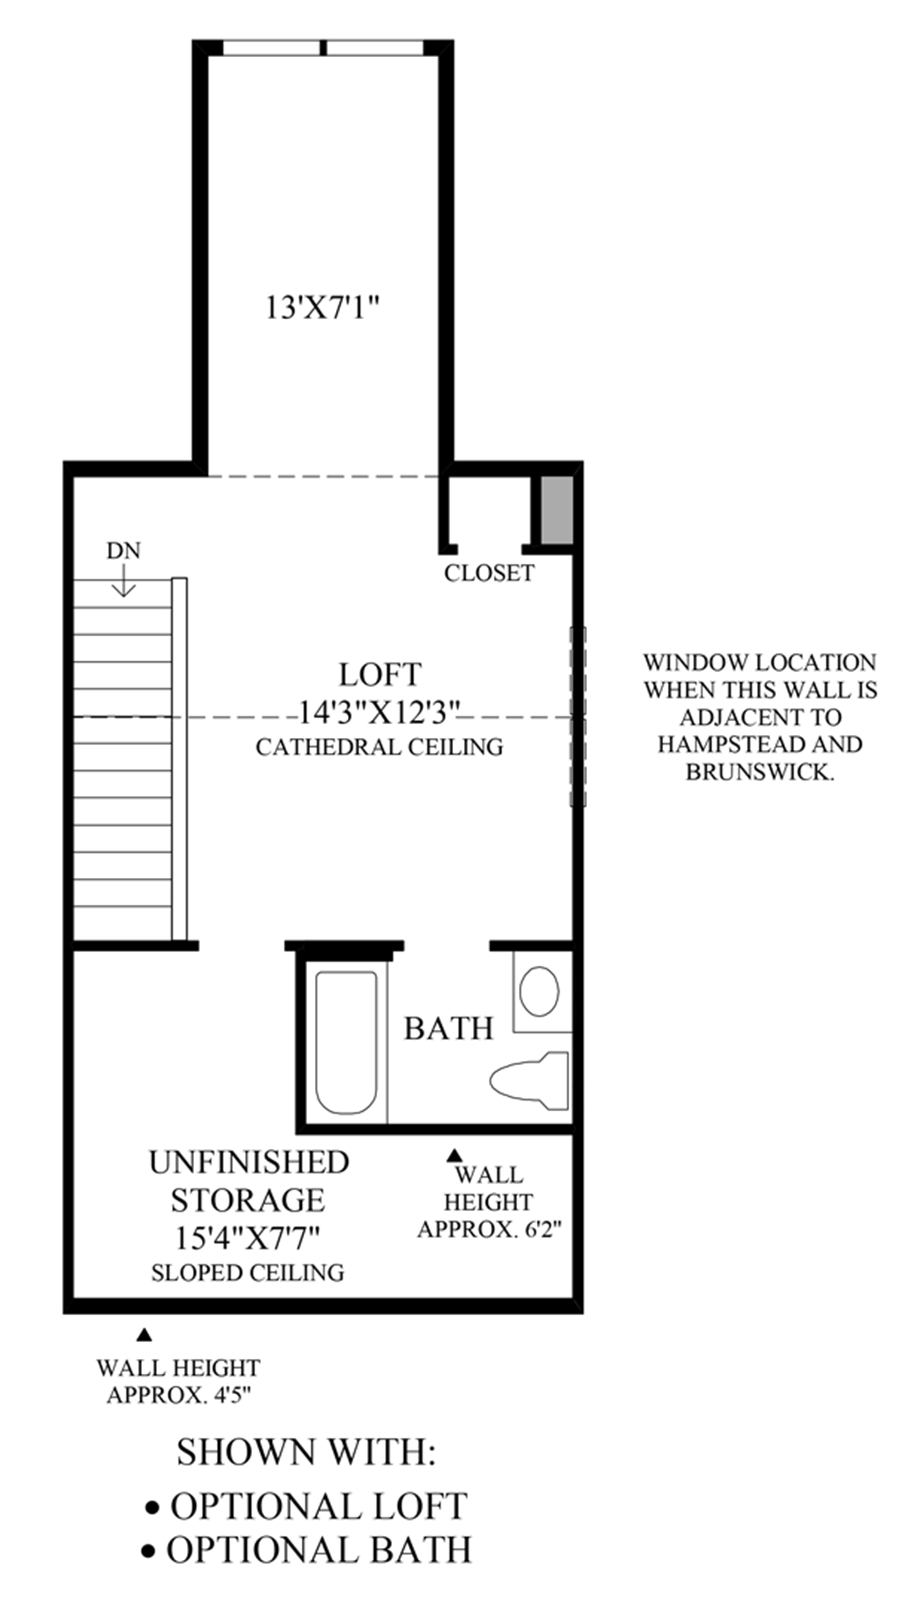 Optional Loft & Bath Floor Plan